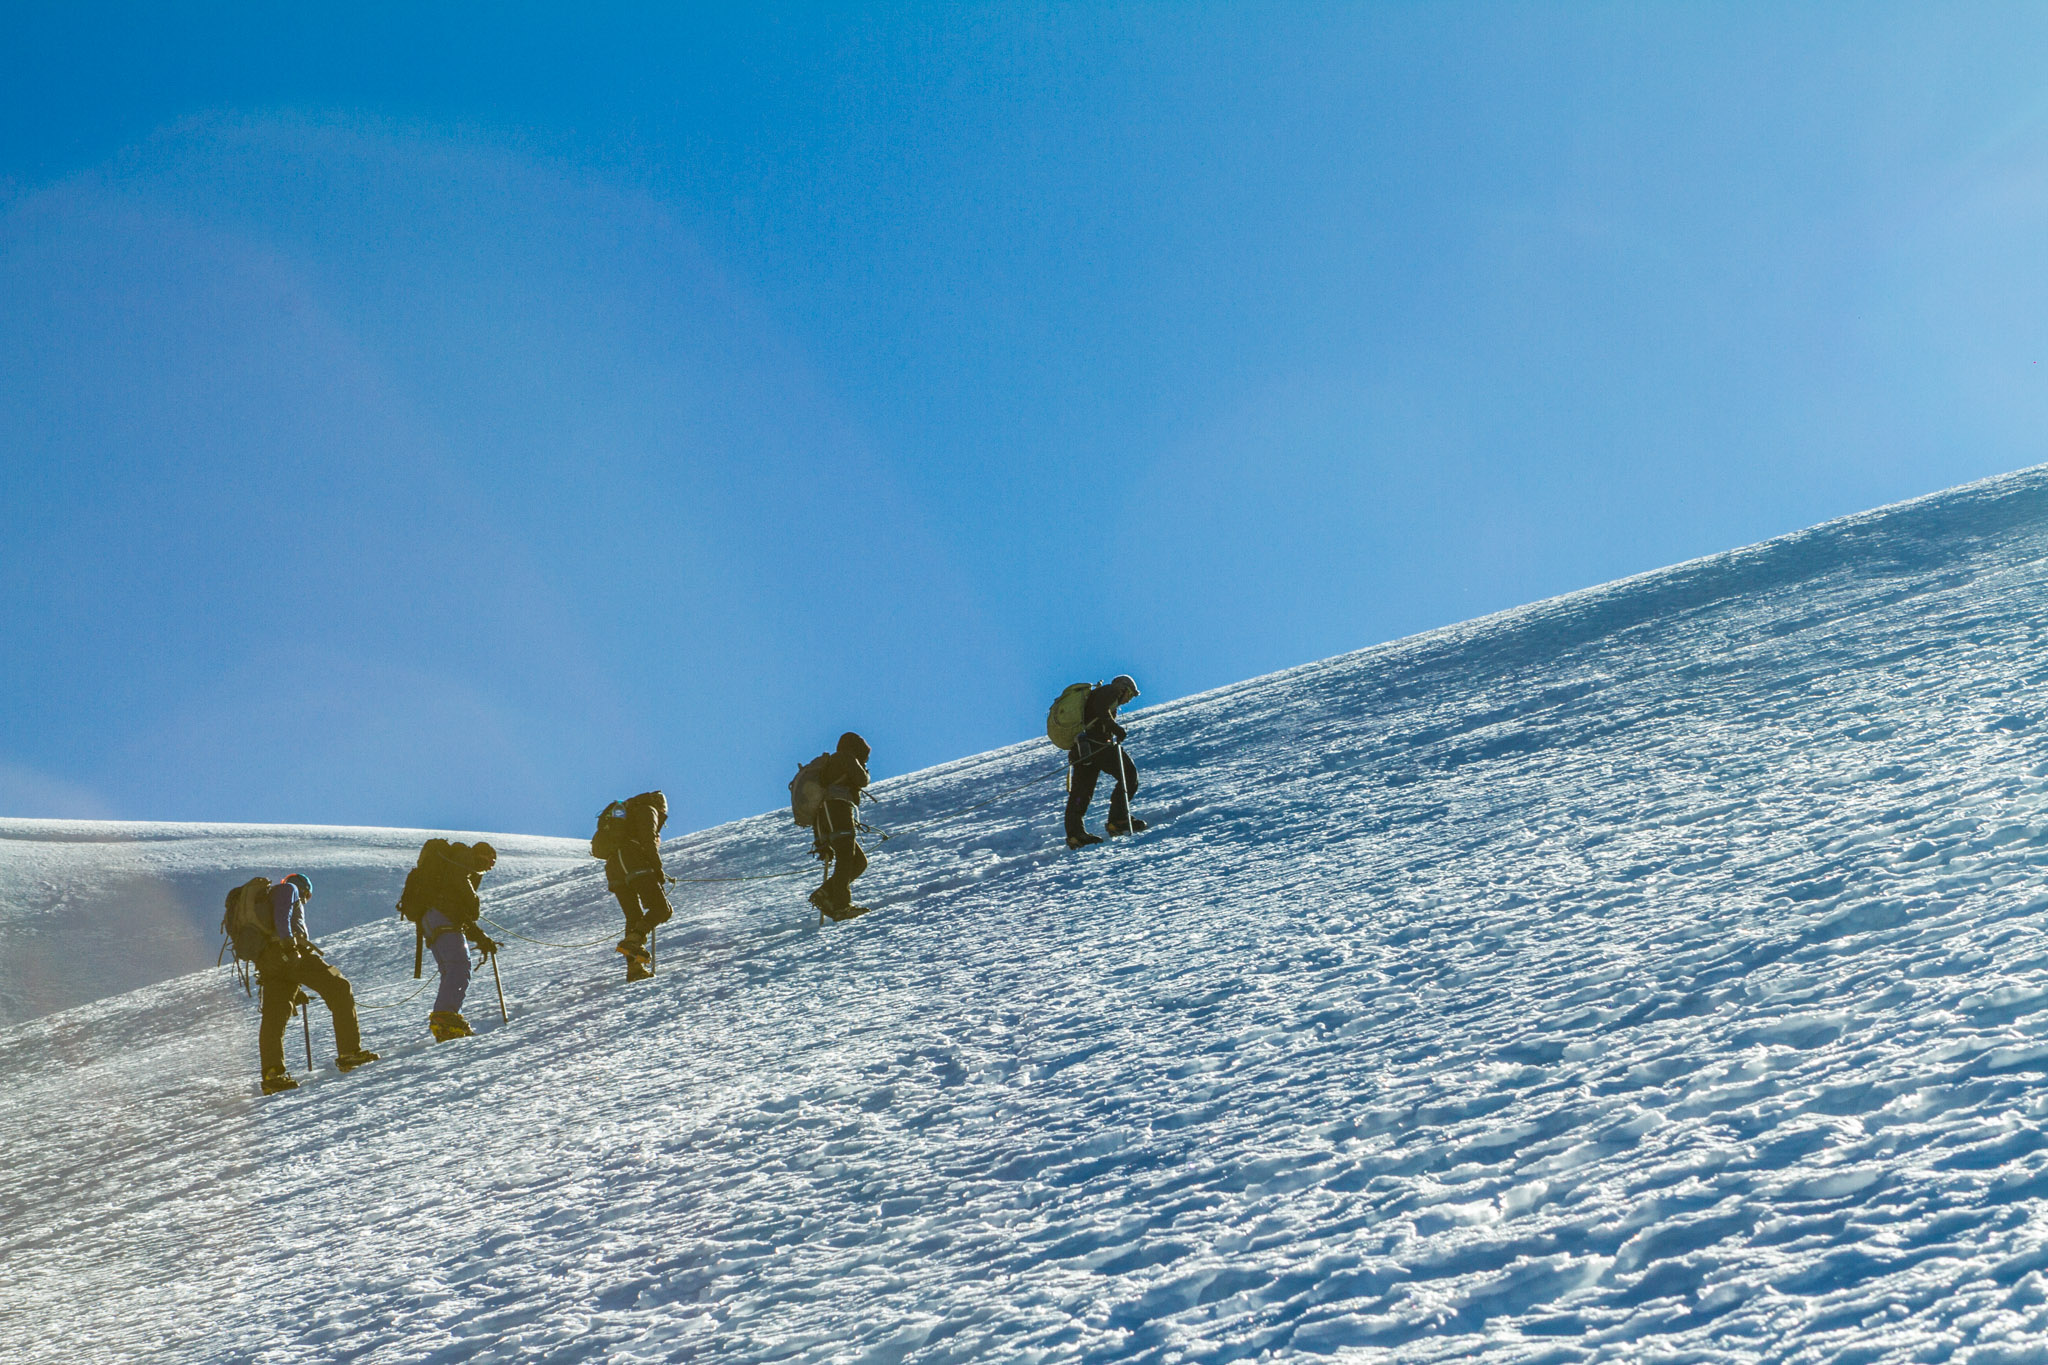 Ali-Barqawi-Studios-Explore-Series-Travel-Adventure-Documentary-C4CGAZA-Bolivia-Mount-Tarija-2015-180.jpg